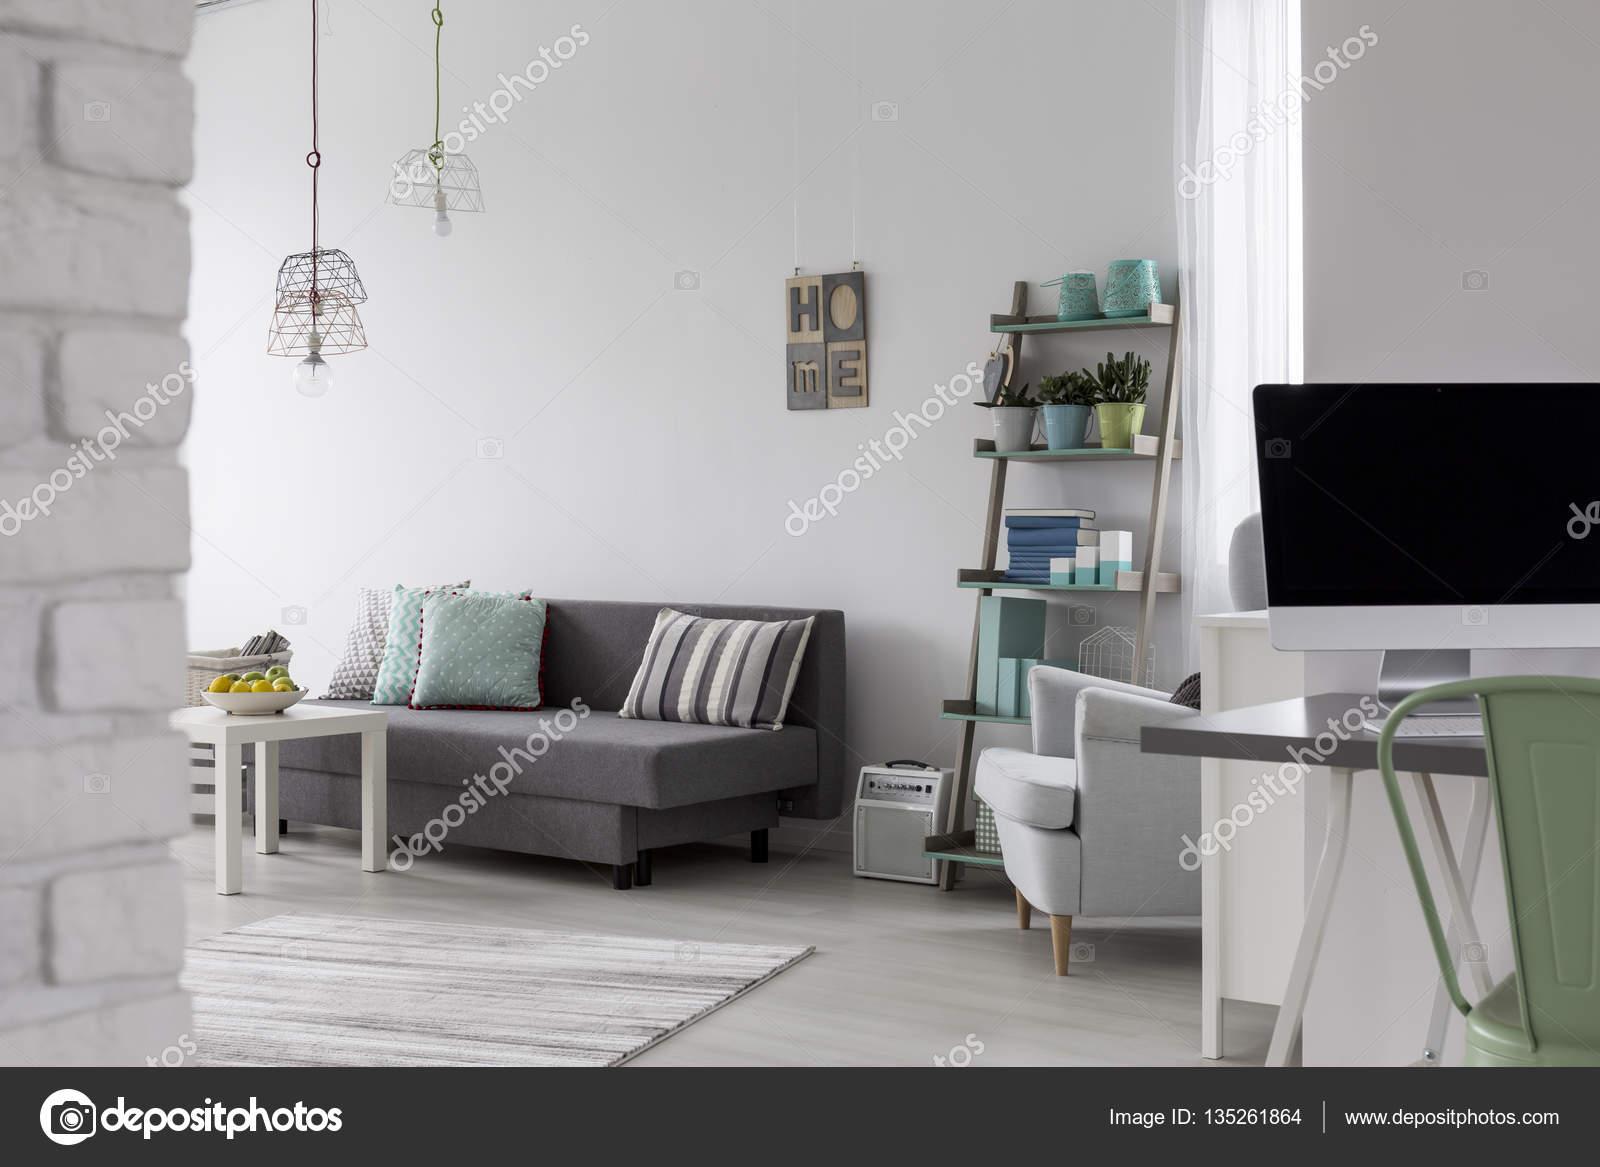 Lounge Stoel Woonkamer : Hippe woonkamer stoel kunststof stoelen voor buiten great